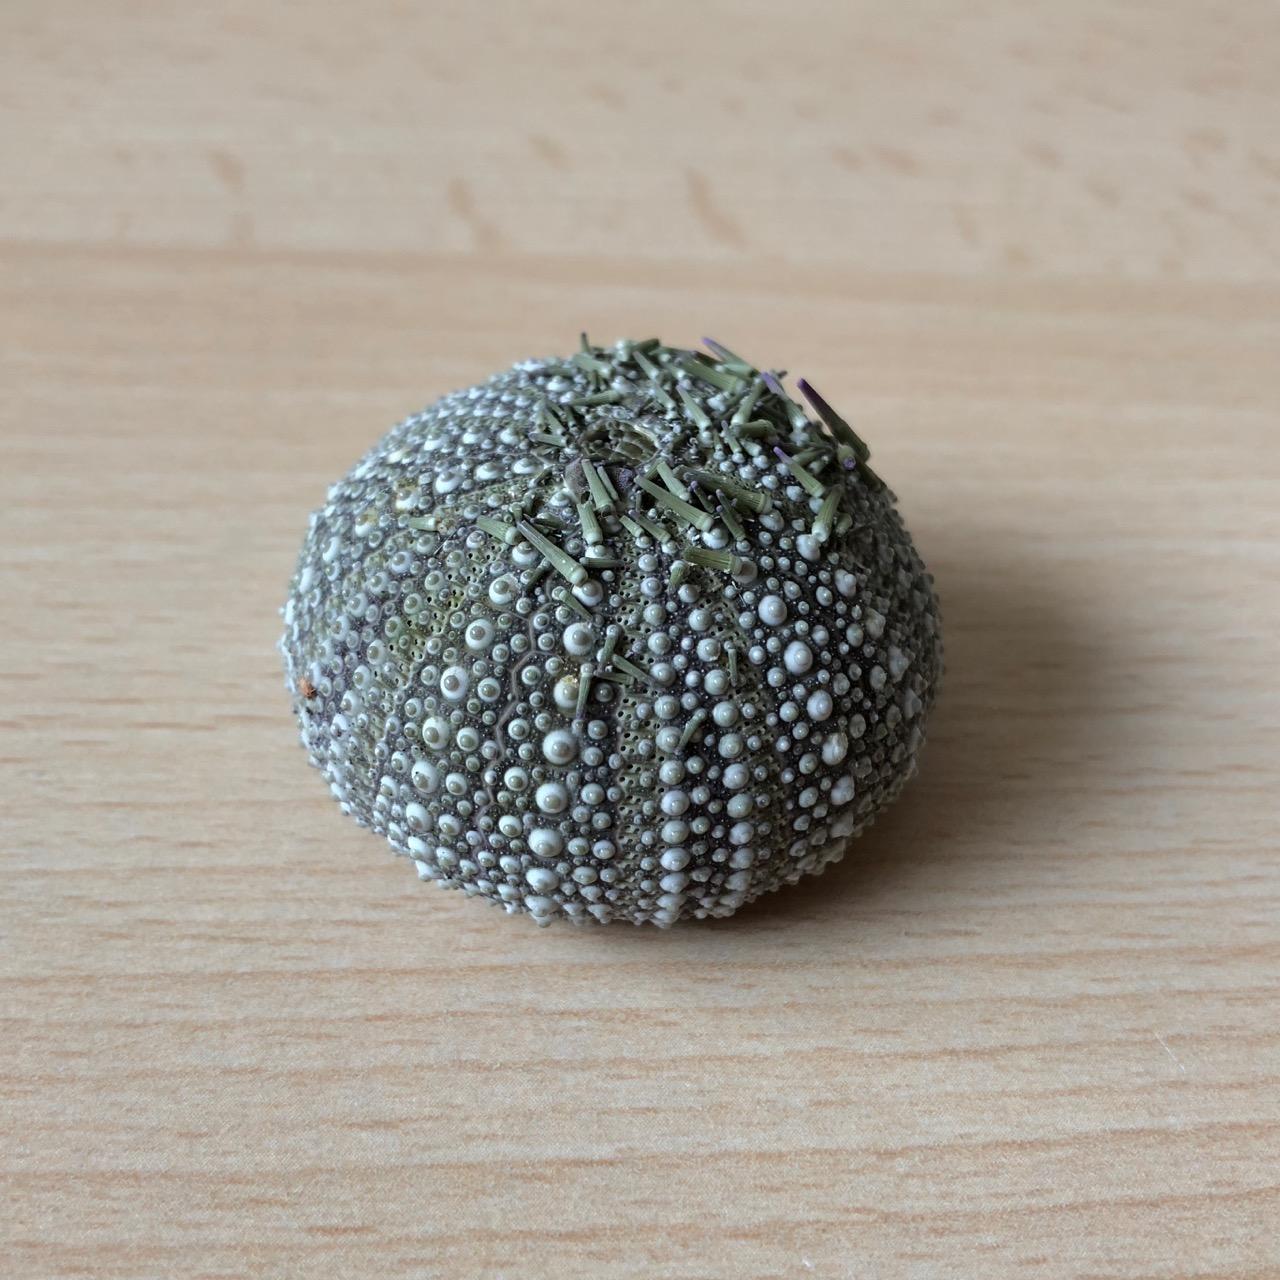 Treasures of the sea : sea urchin